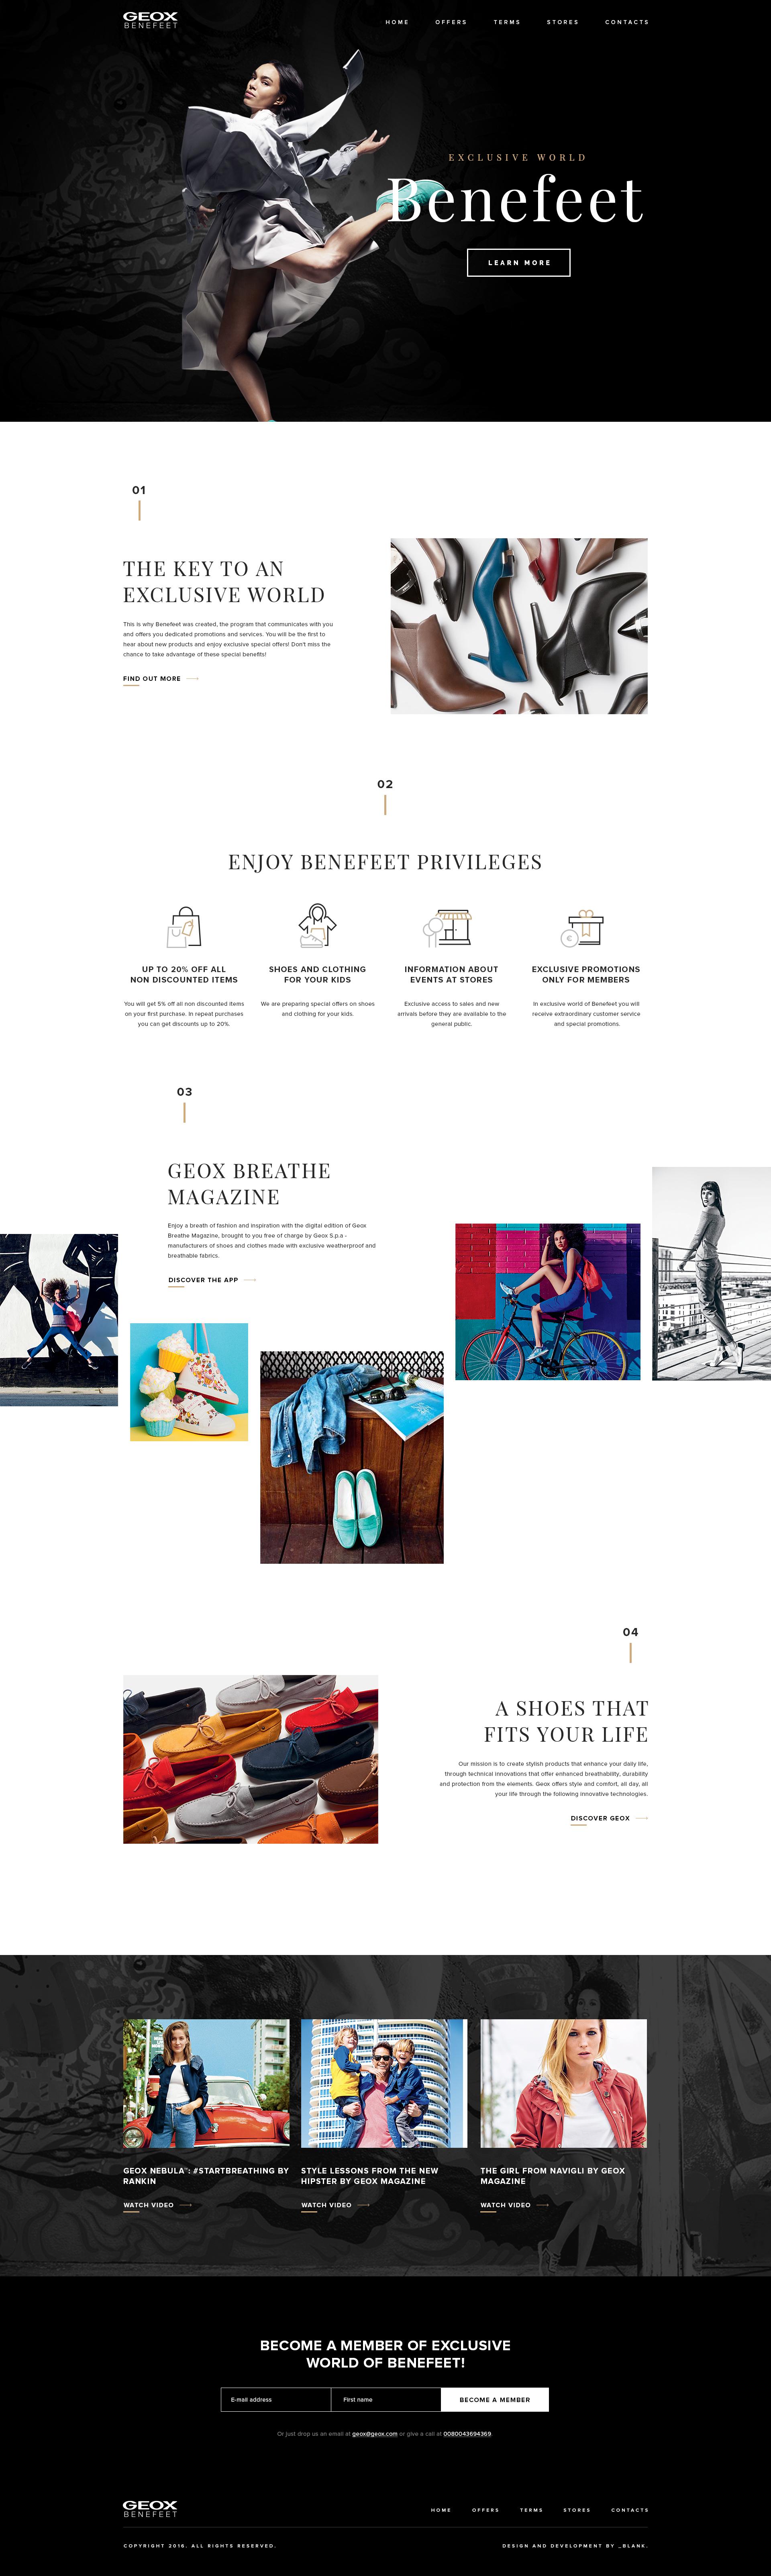 Geox benefeet landing page